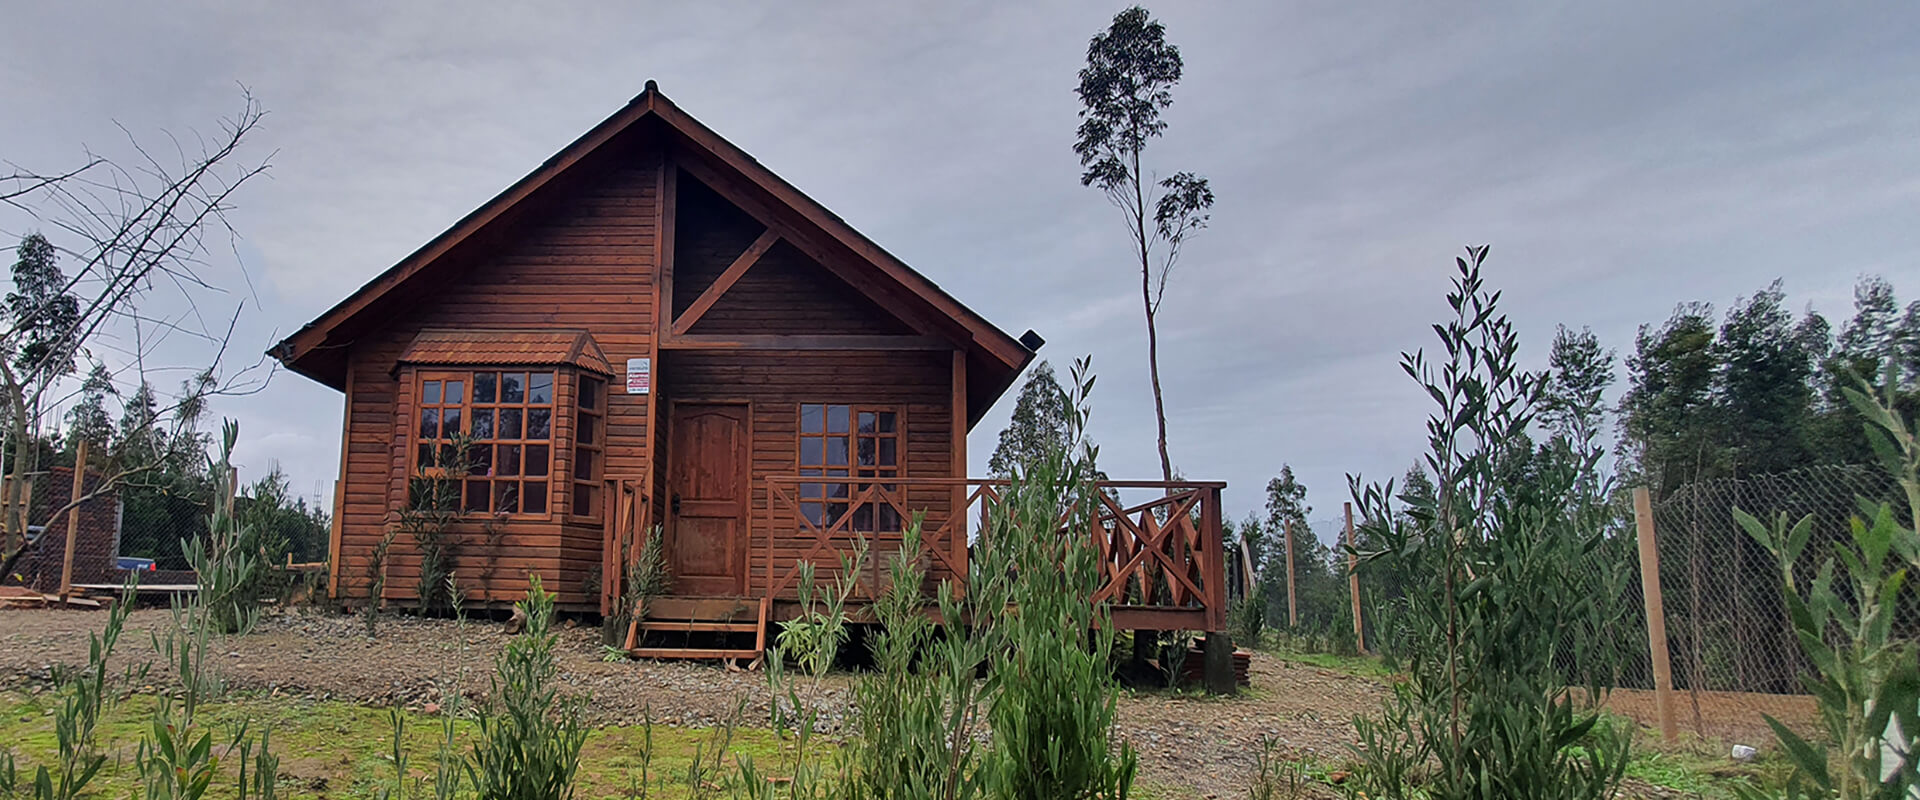 Casas Prefabricadas coliumo